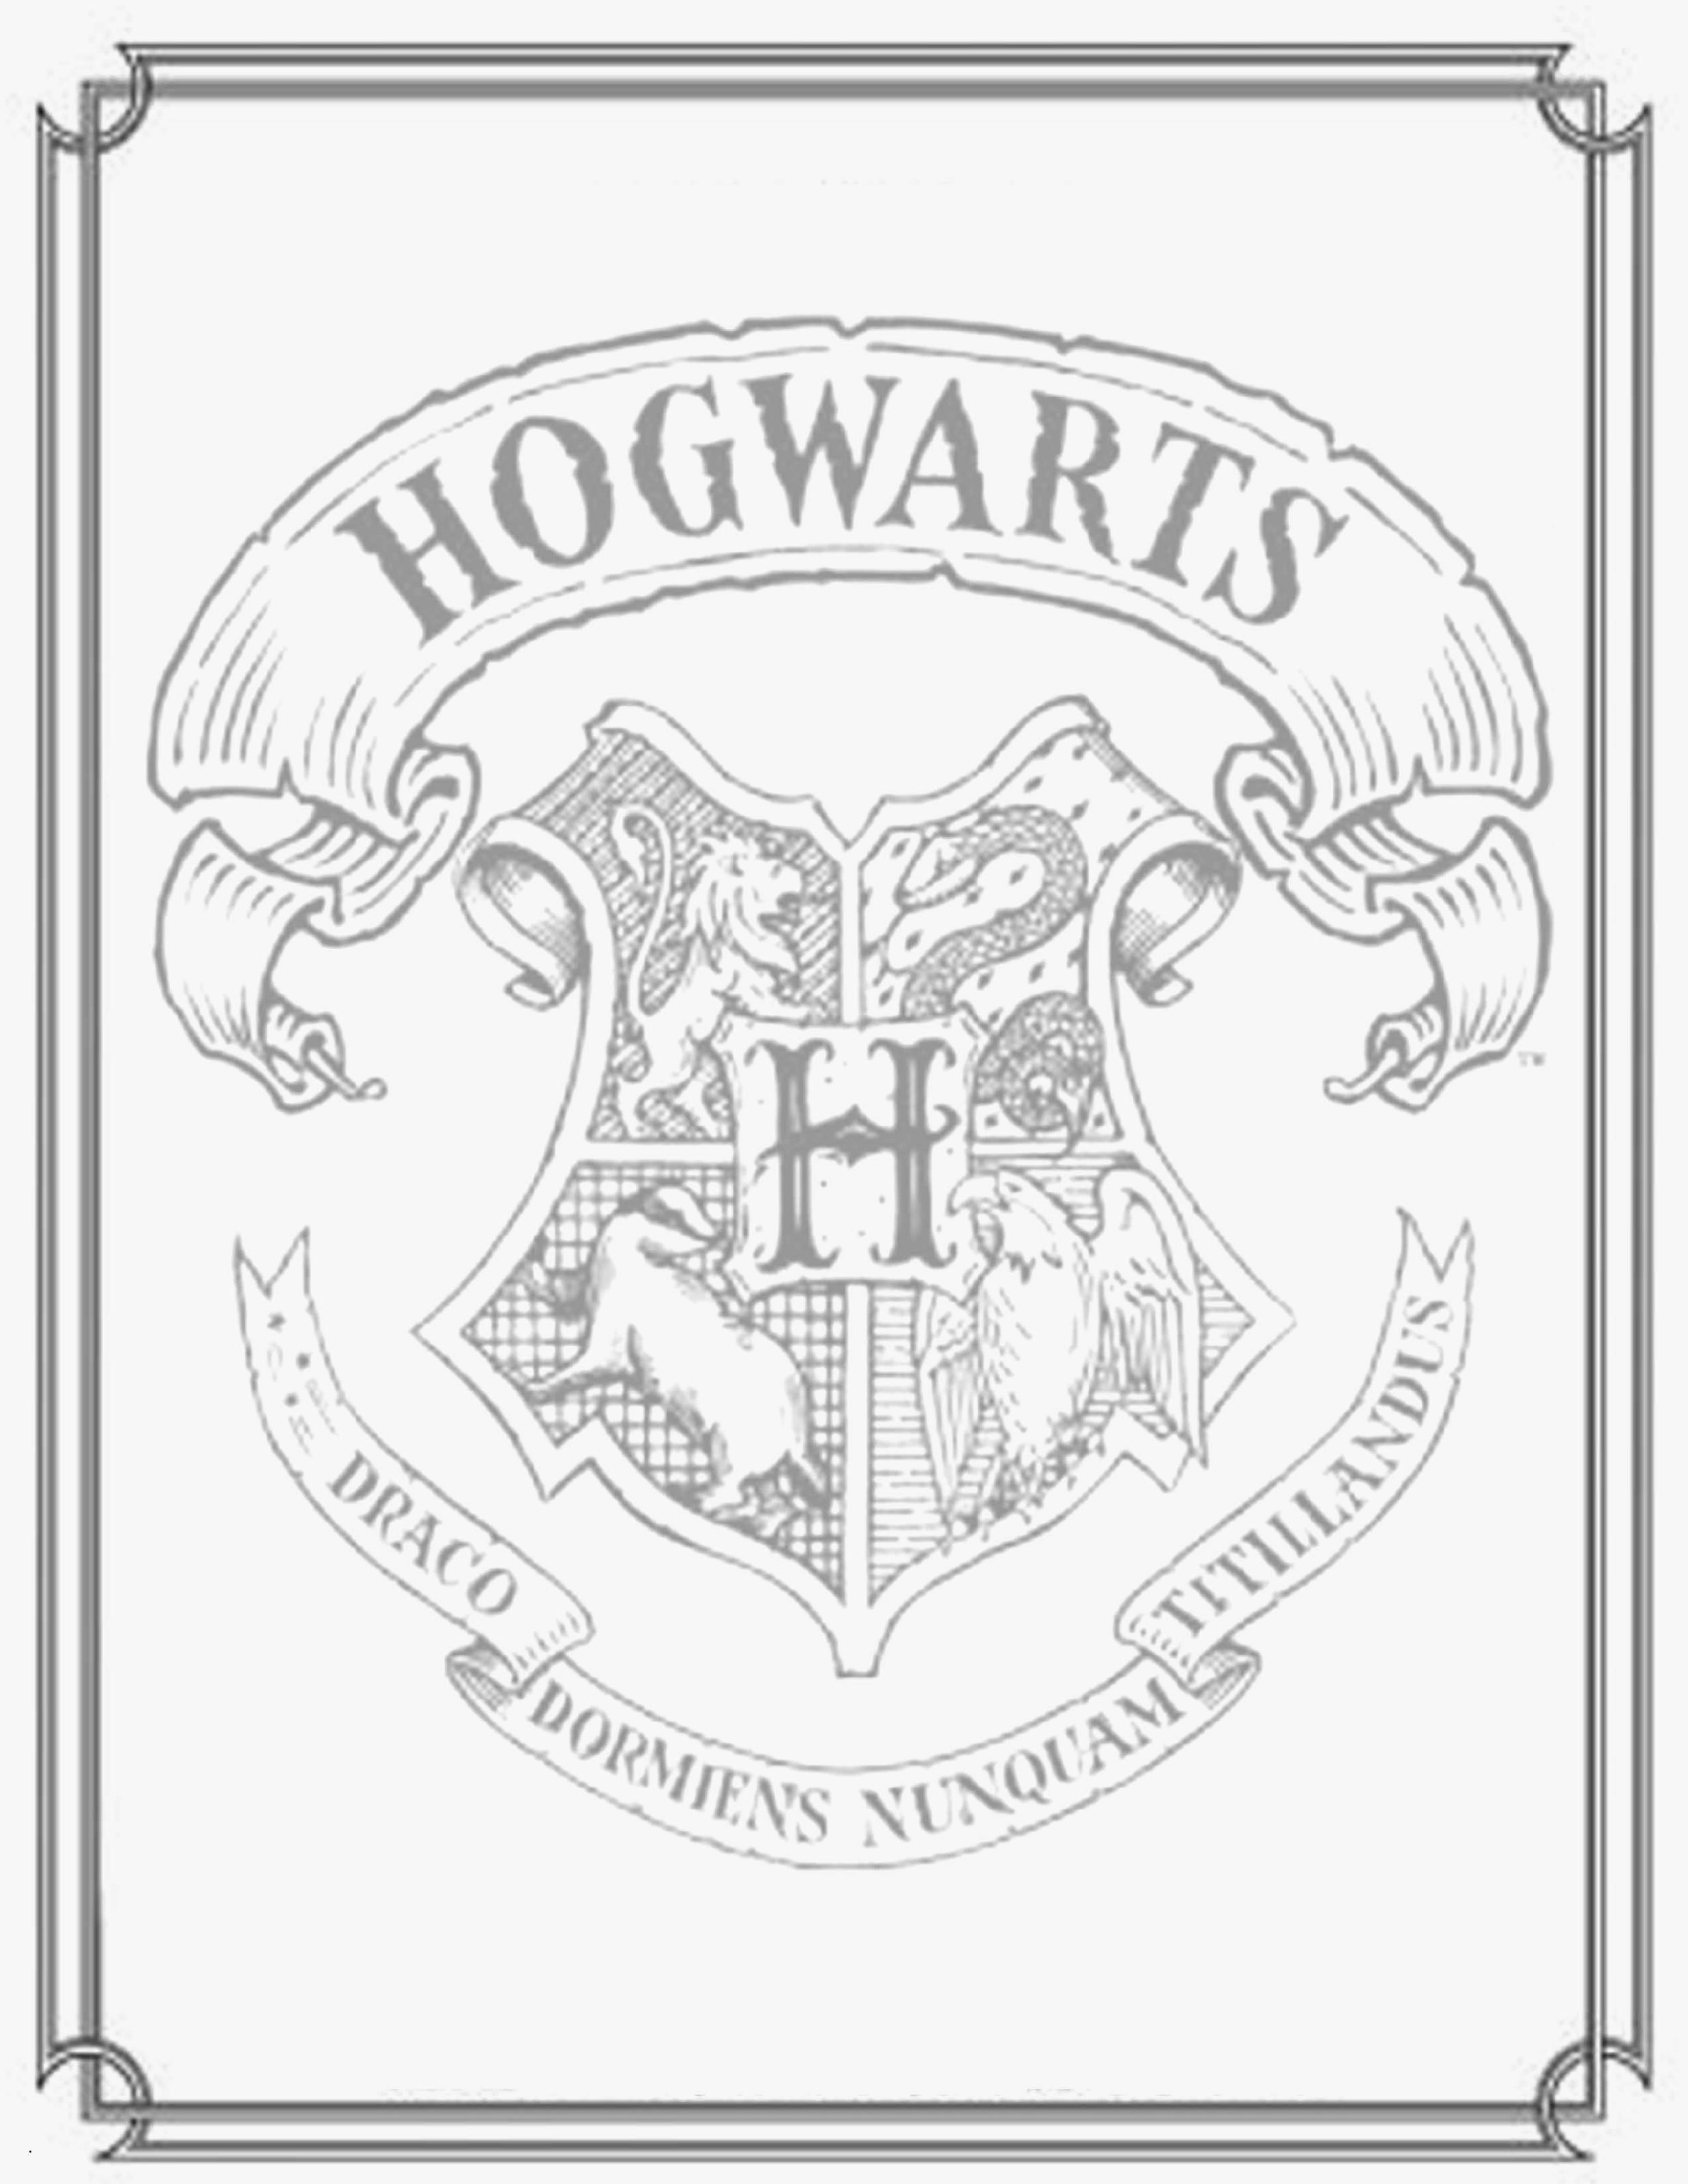 Harry Potter Ausmalbilder Wappen Einzigartig Harry Potter Ausmalbilder Einzigartig Konabeun Zum Ausdrucken Neu Fotografieren